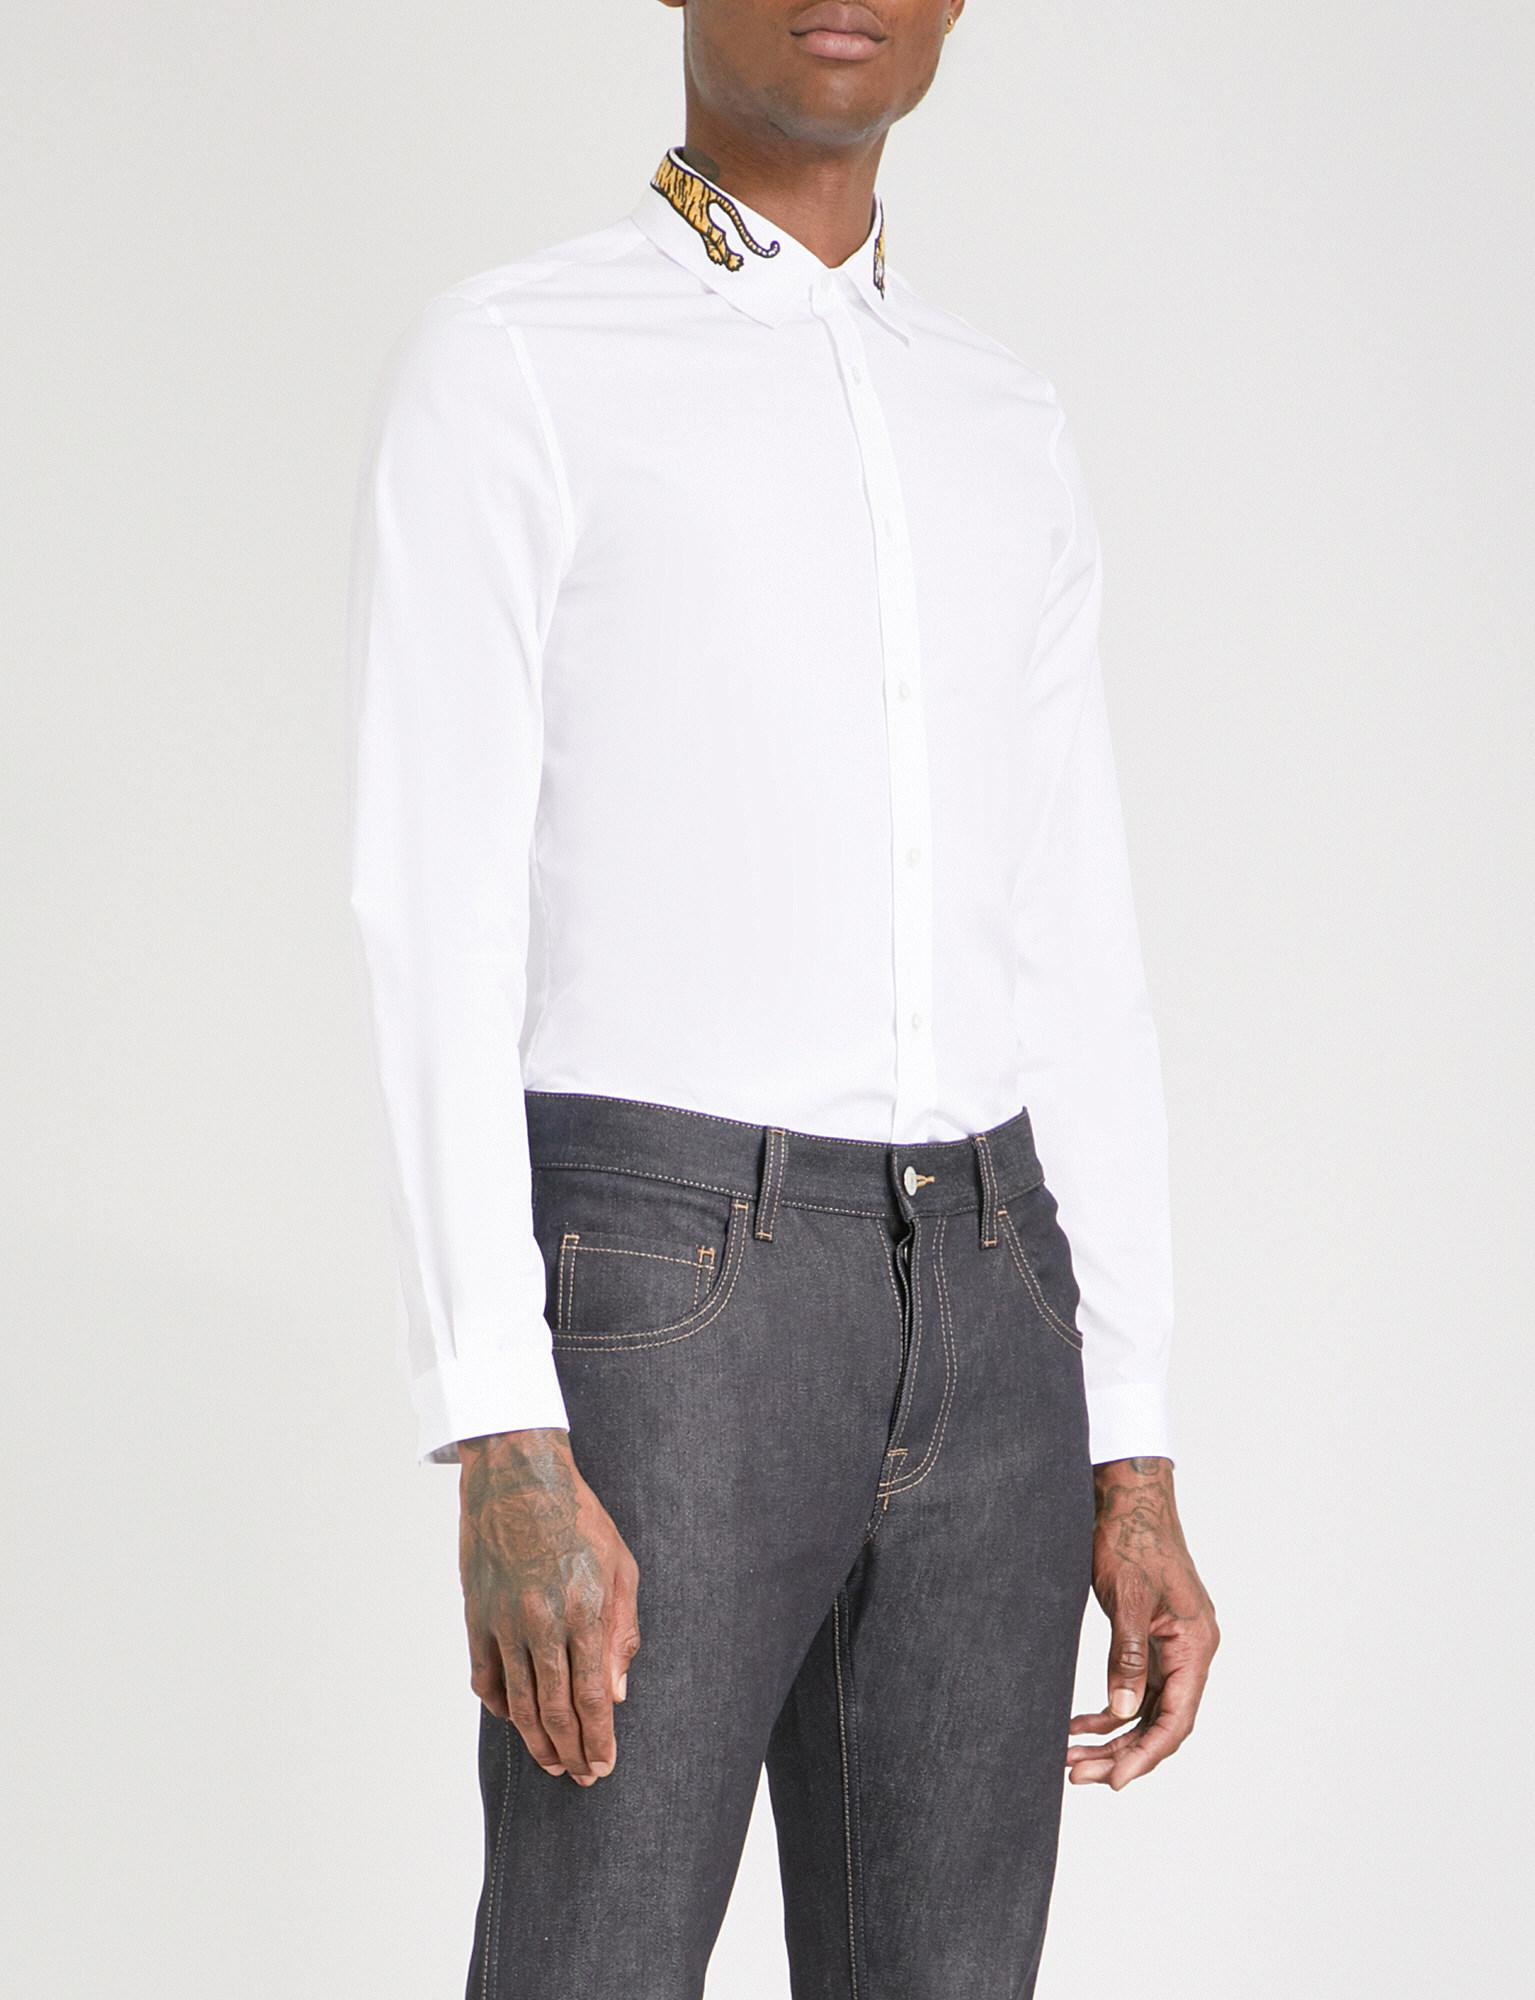 acbd7c95 Lyst - Gucci Duke Tiger-embroidered Regular-fit Cotton-poplin Shirt ...